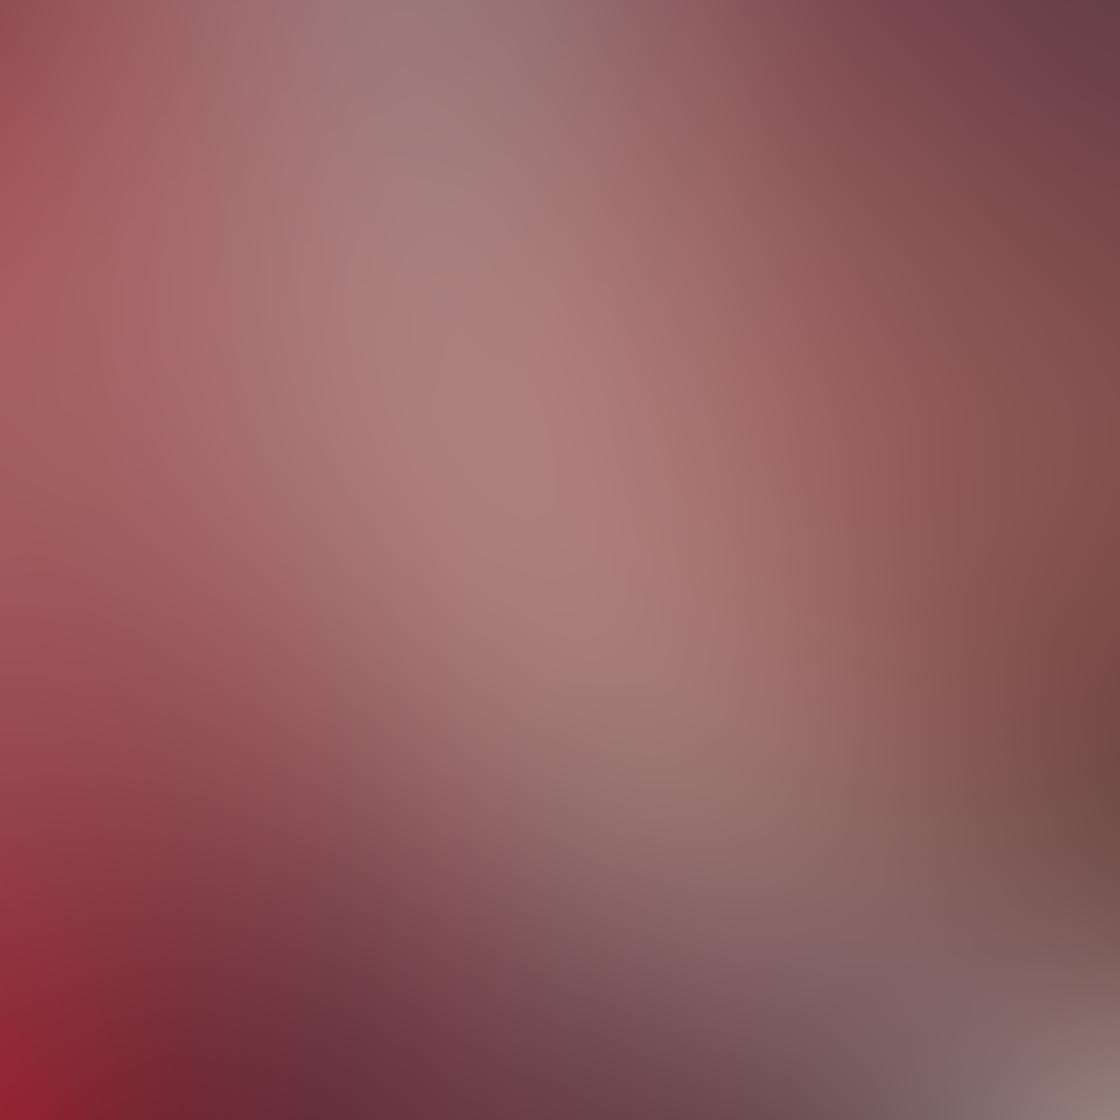 iPhone Angle Photo 11